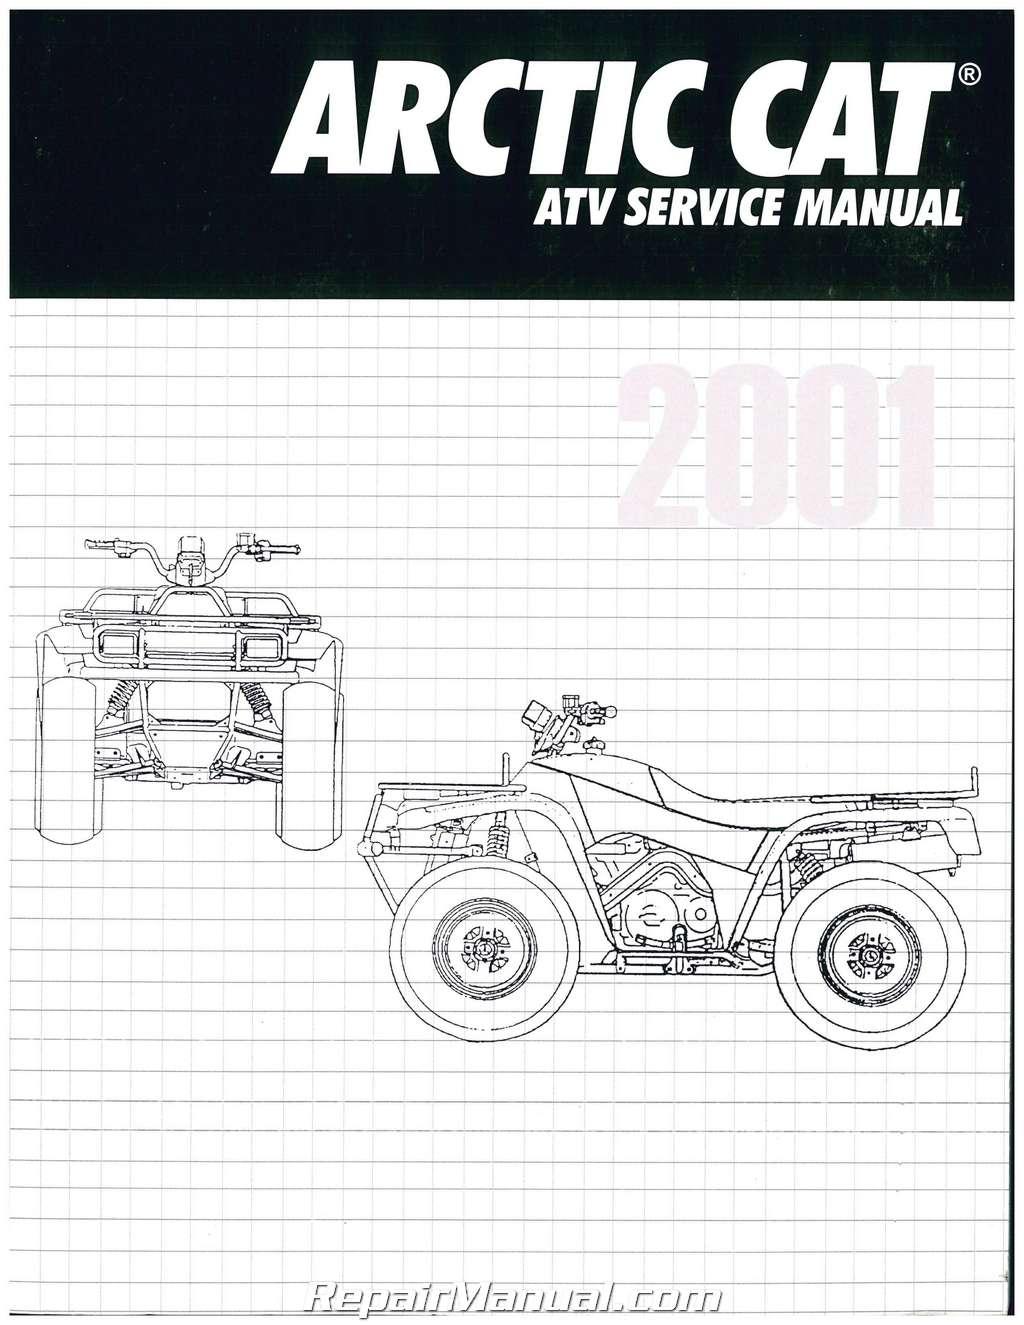 2001 Arctic Cat 250 300 400 500 Atv Service Manual